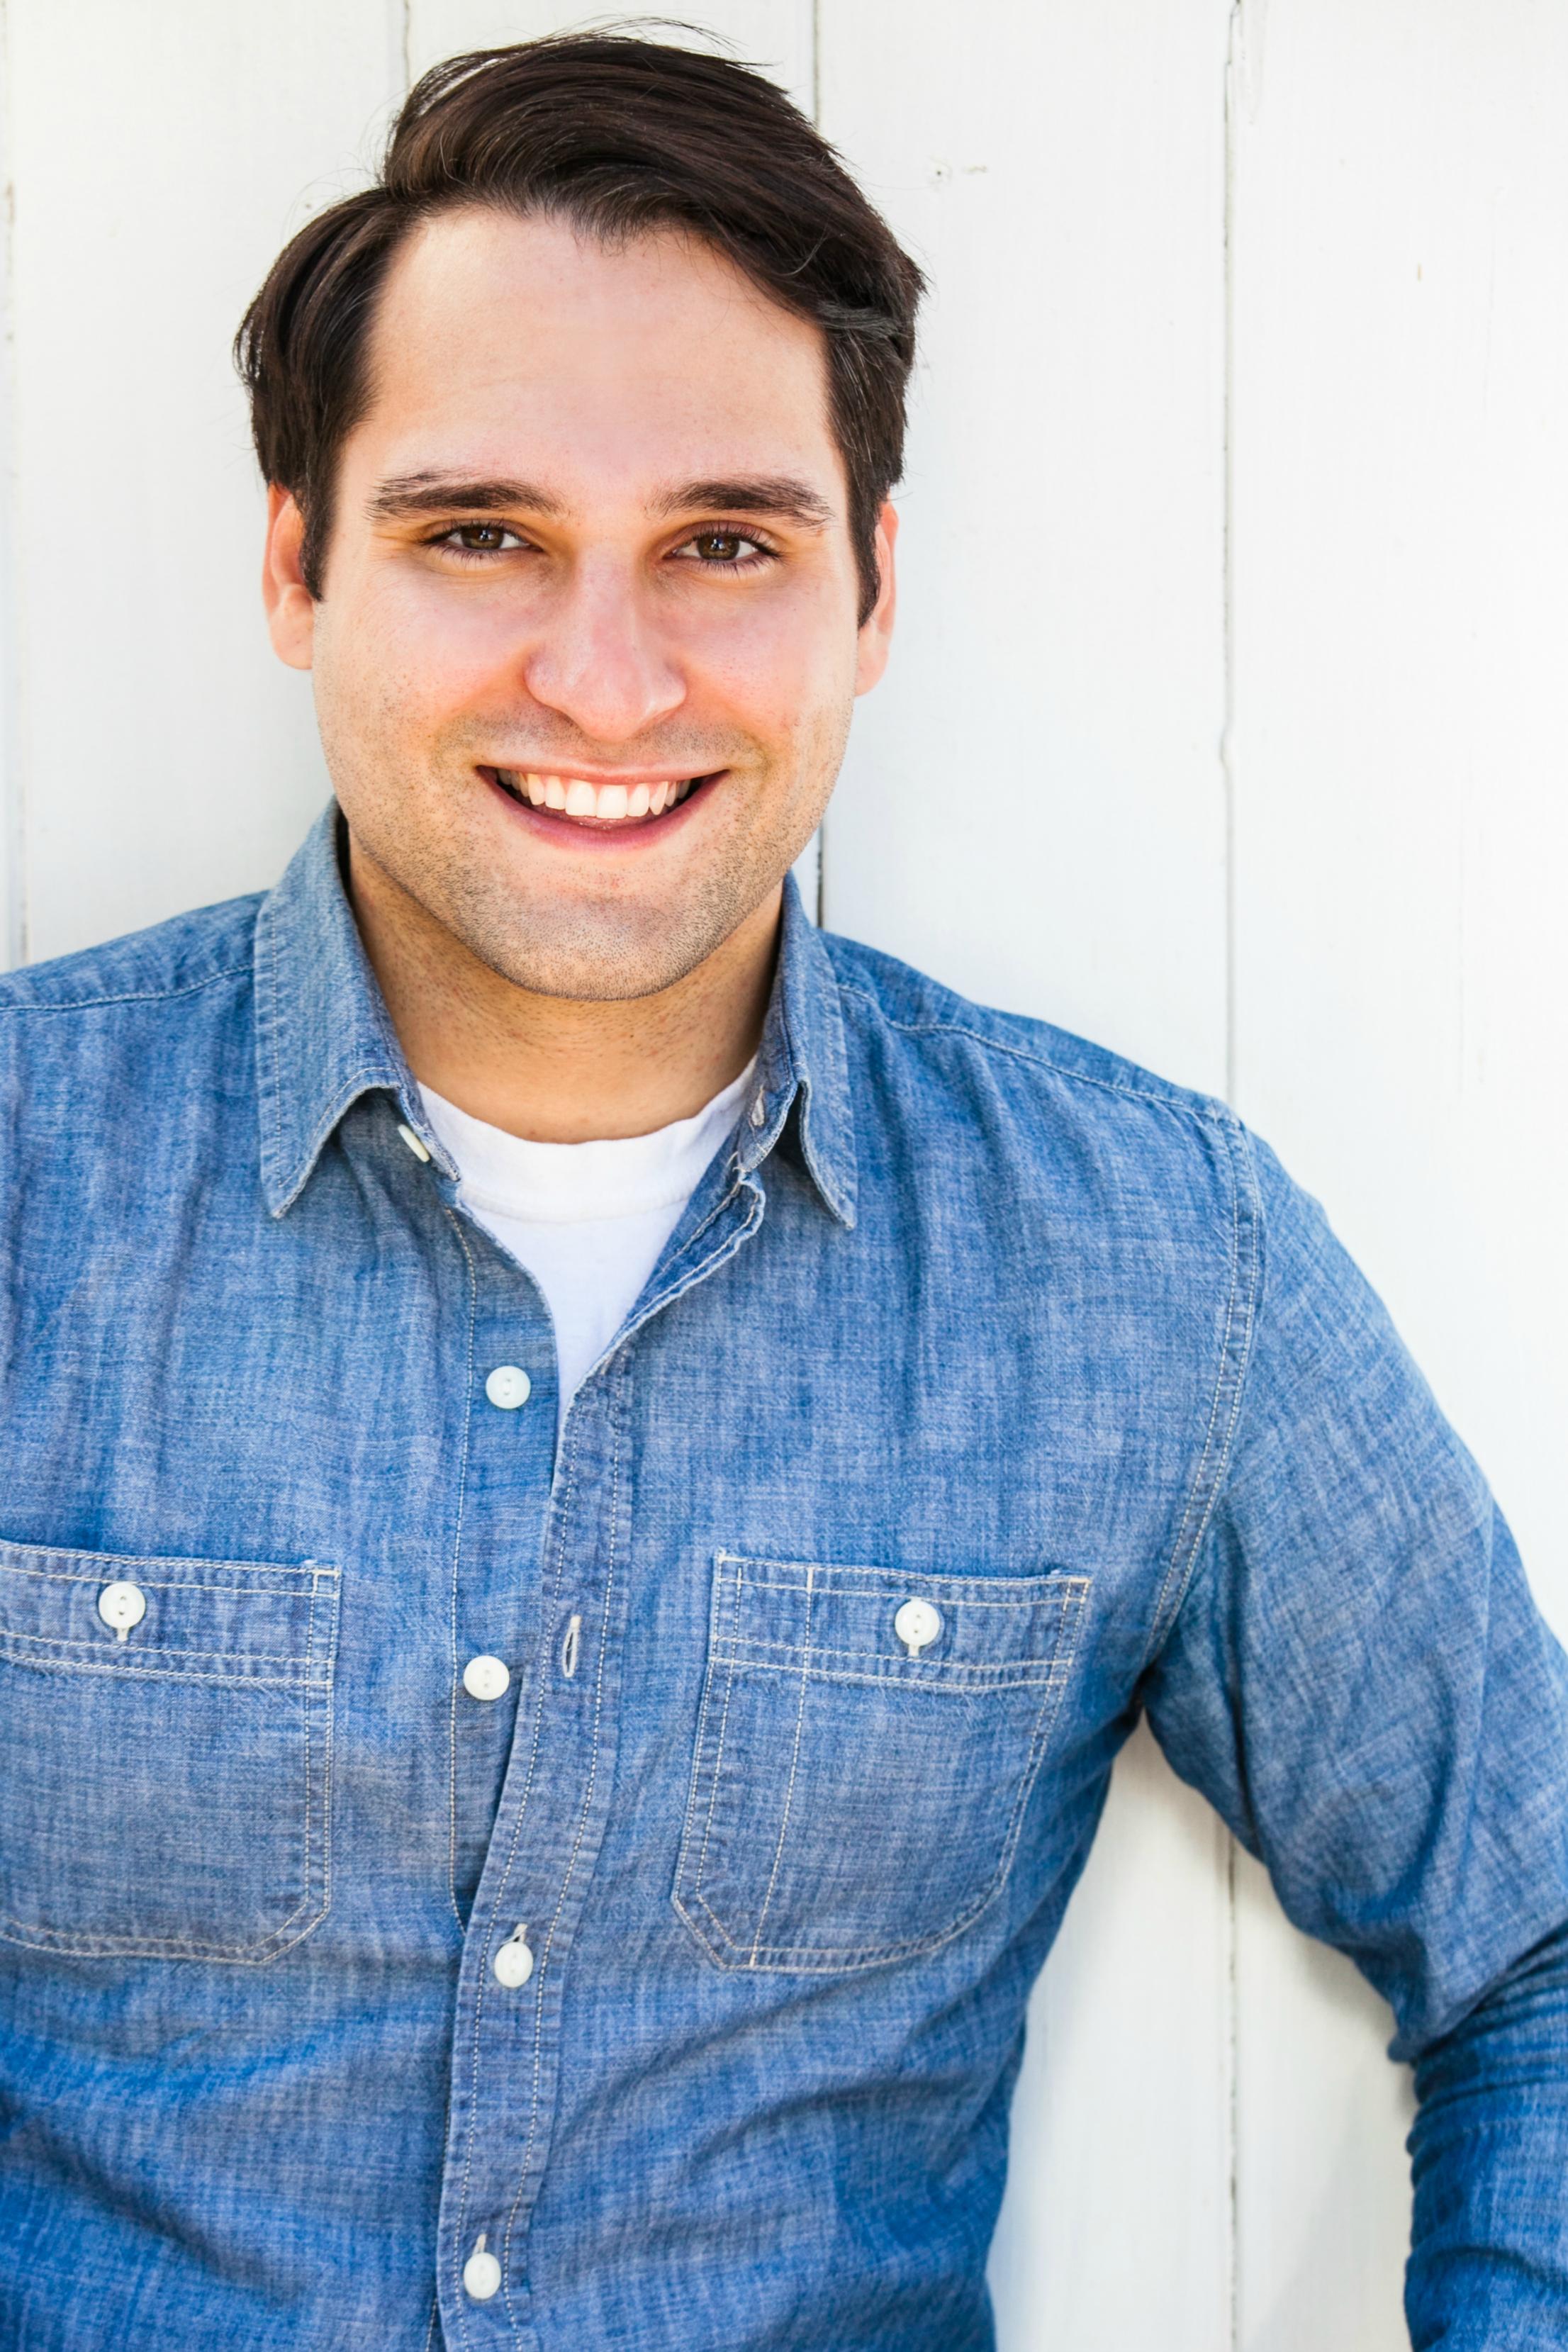 Aaron Mateo Arroyo